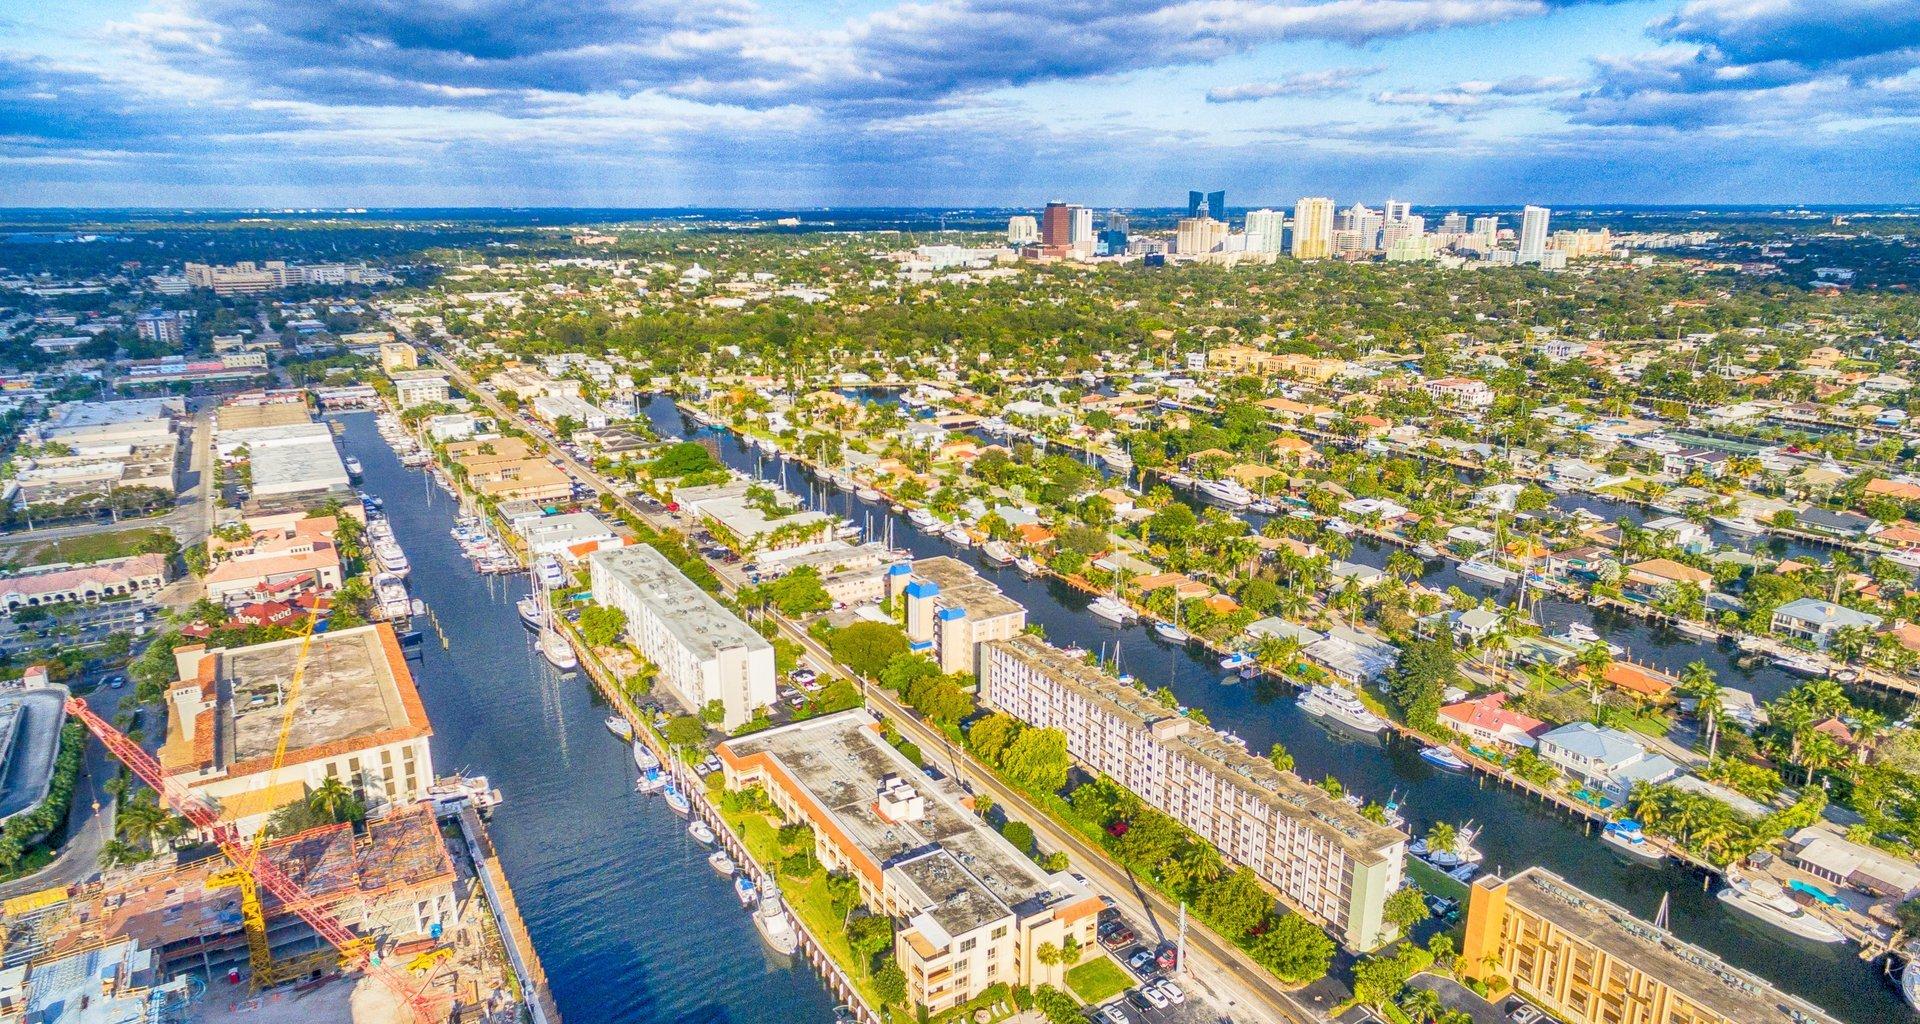 Ft. Lauderdale Florida Mortgage Company